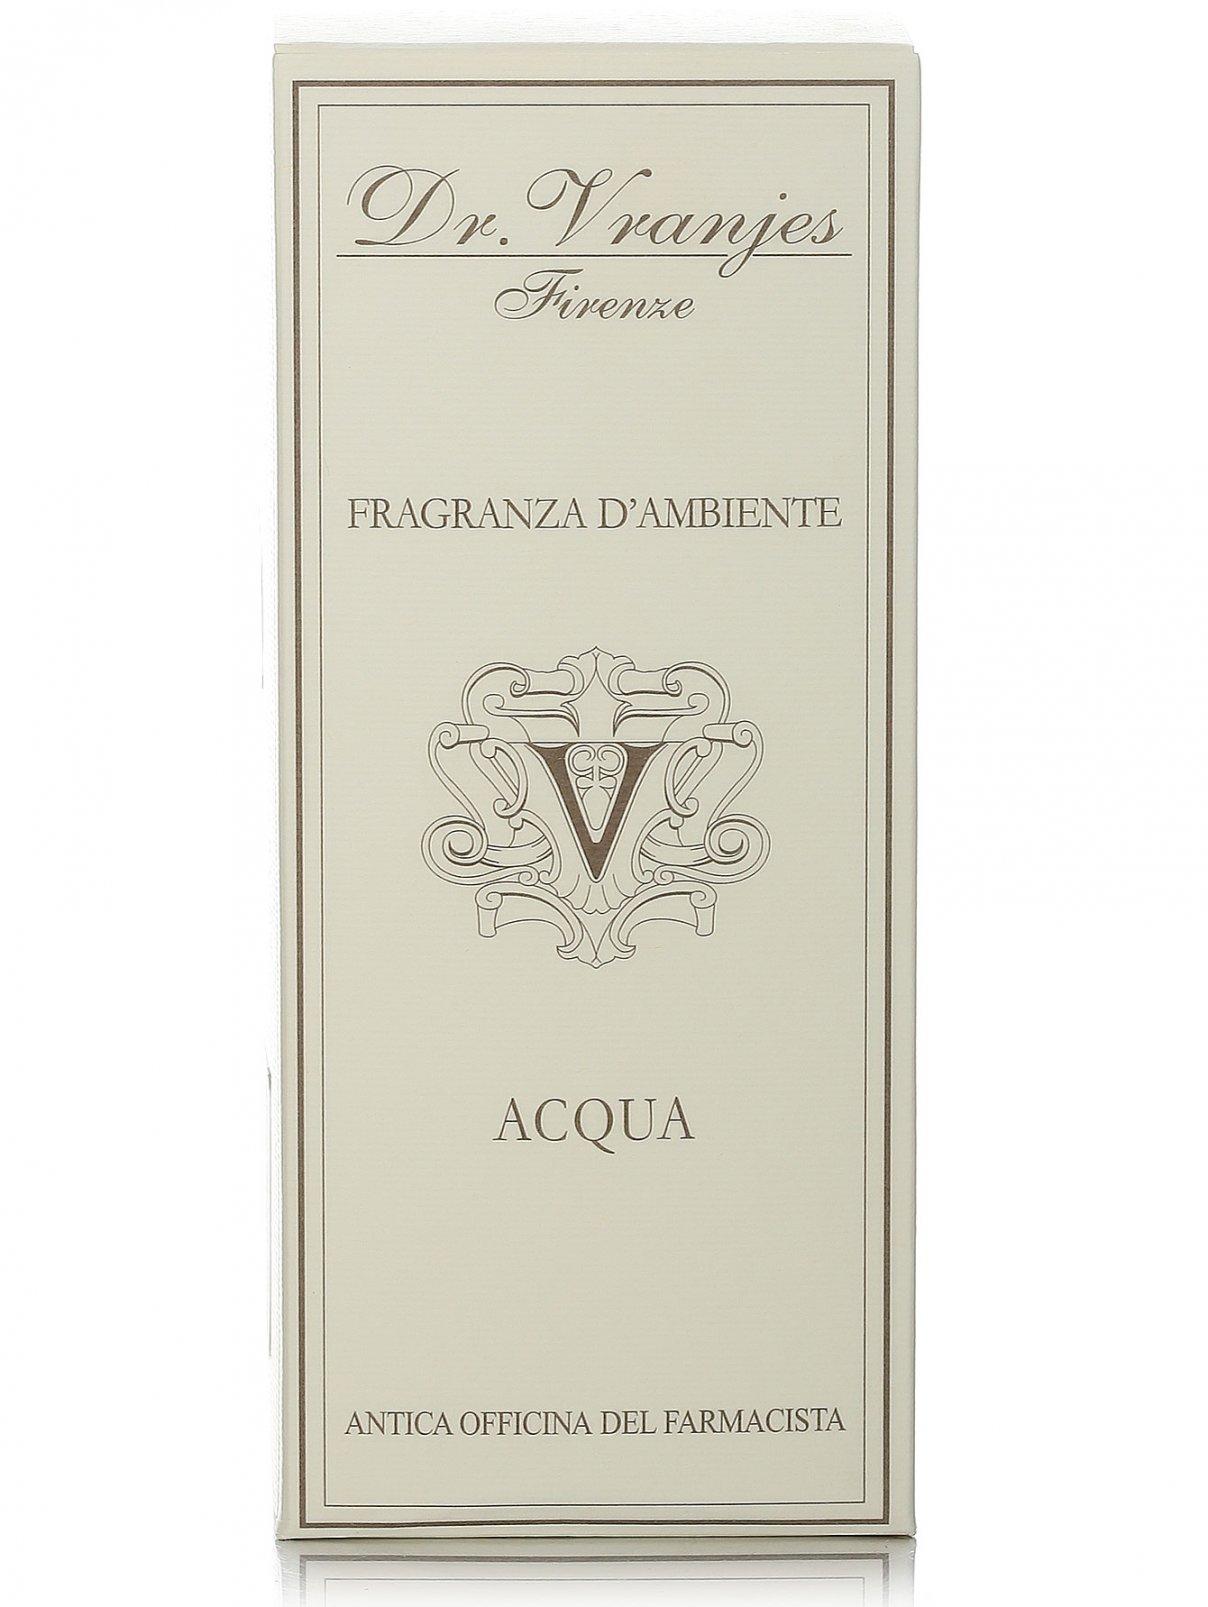 Ароматизатор воздуха Acqua - Home Fragrance, 250ml Dr. Vranjes  –  Модель Общий вид